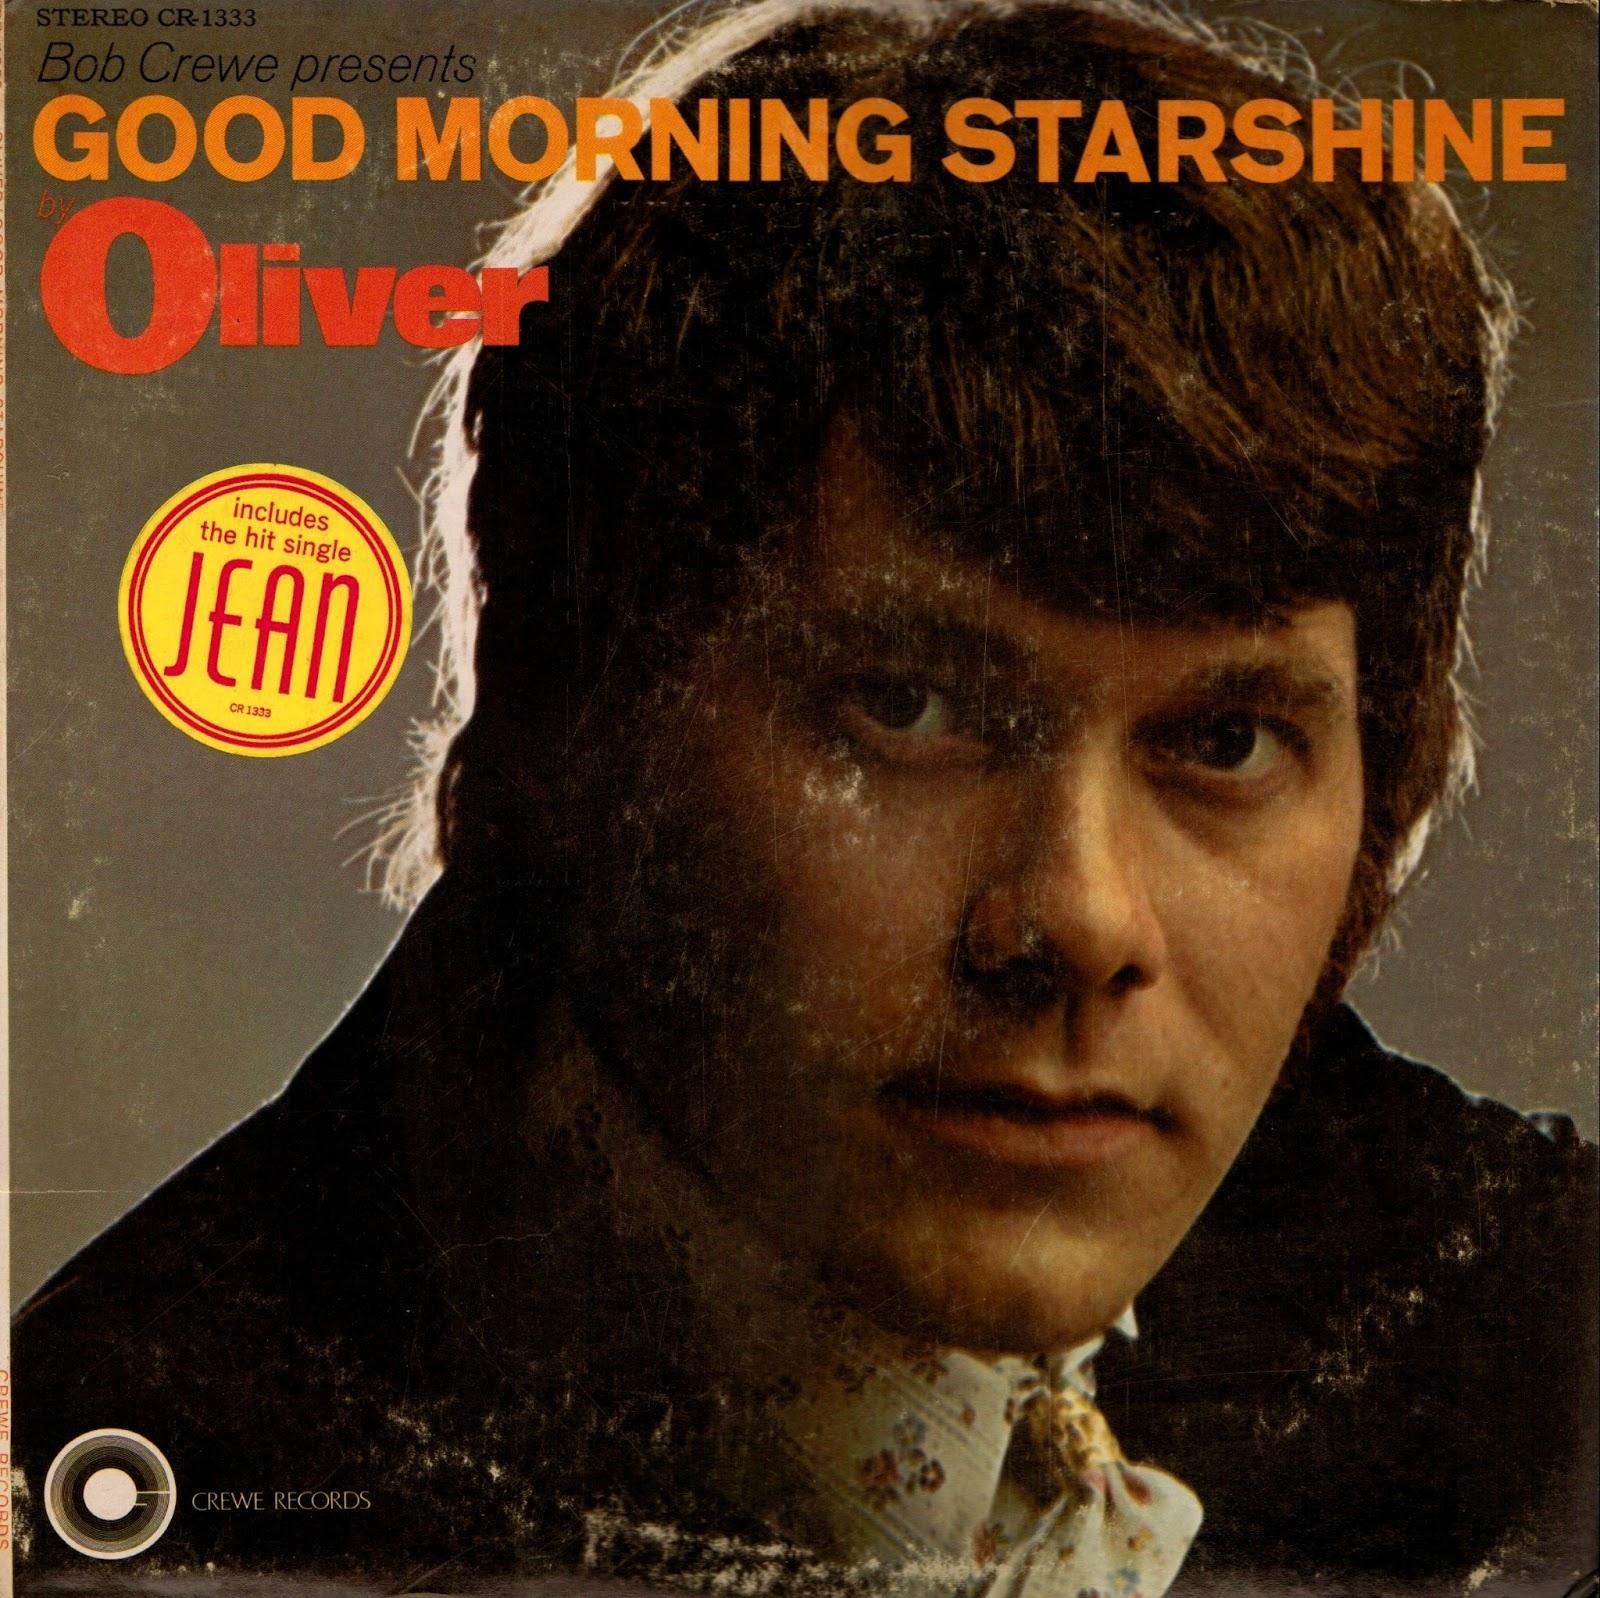 Good Morning Starshine Oliver Download : Vinyl shipwreck oliver good morning starshine